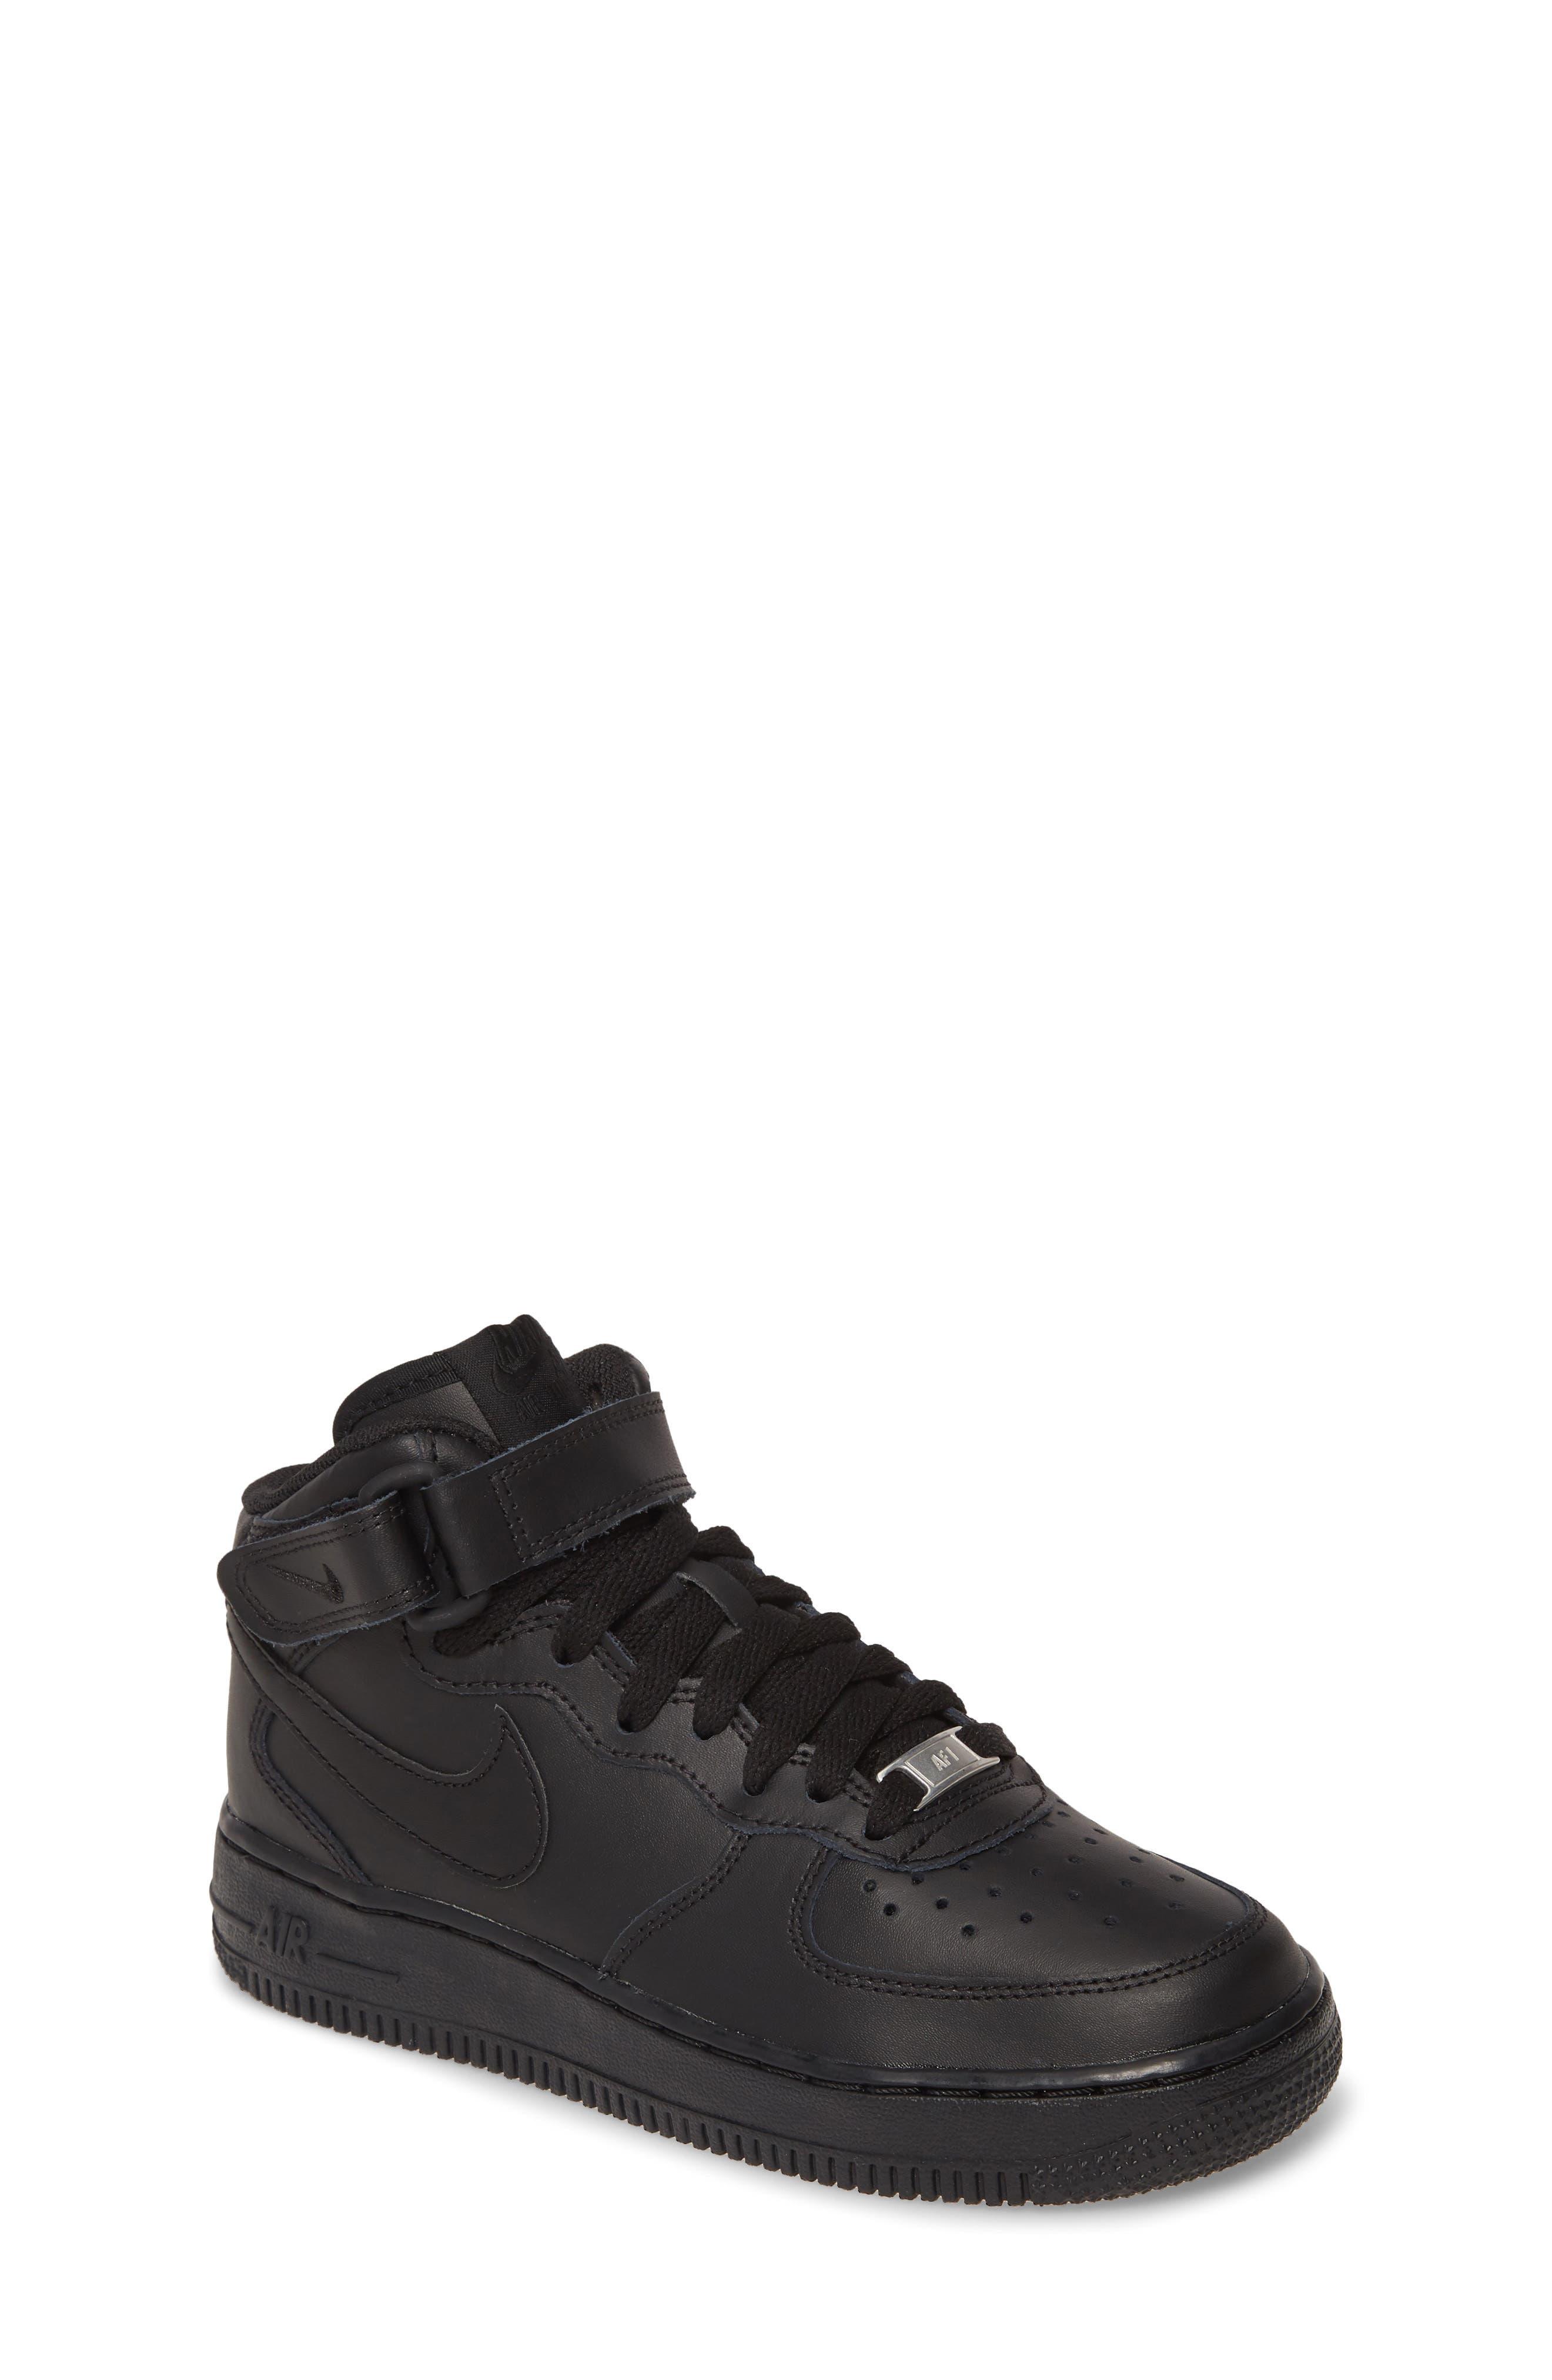 Nike Little Kids Air Force 1 Mid Basketball Shoe